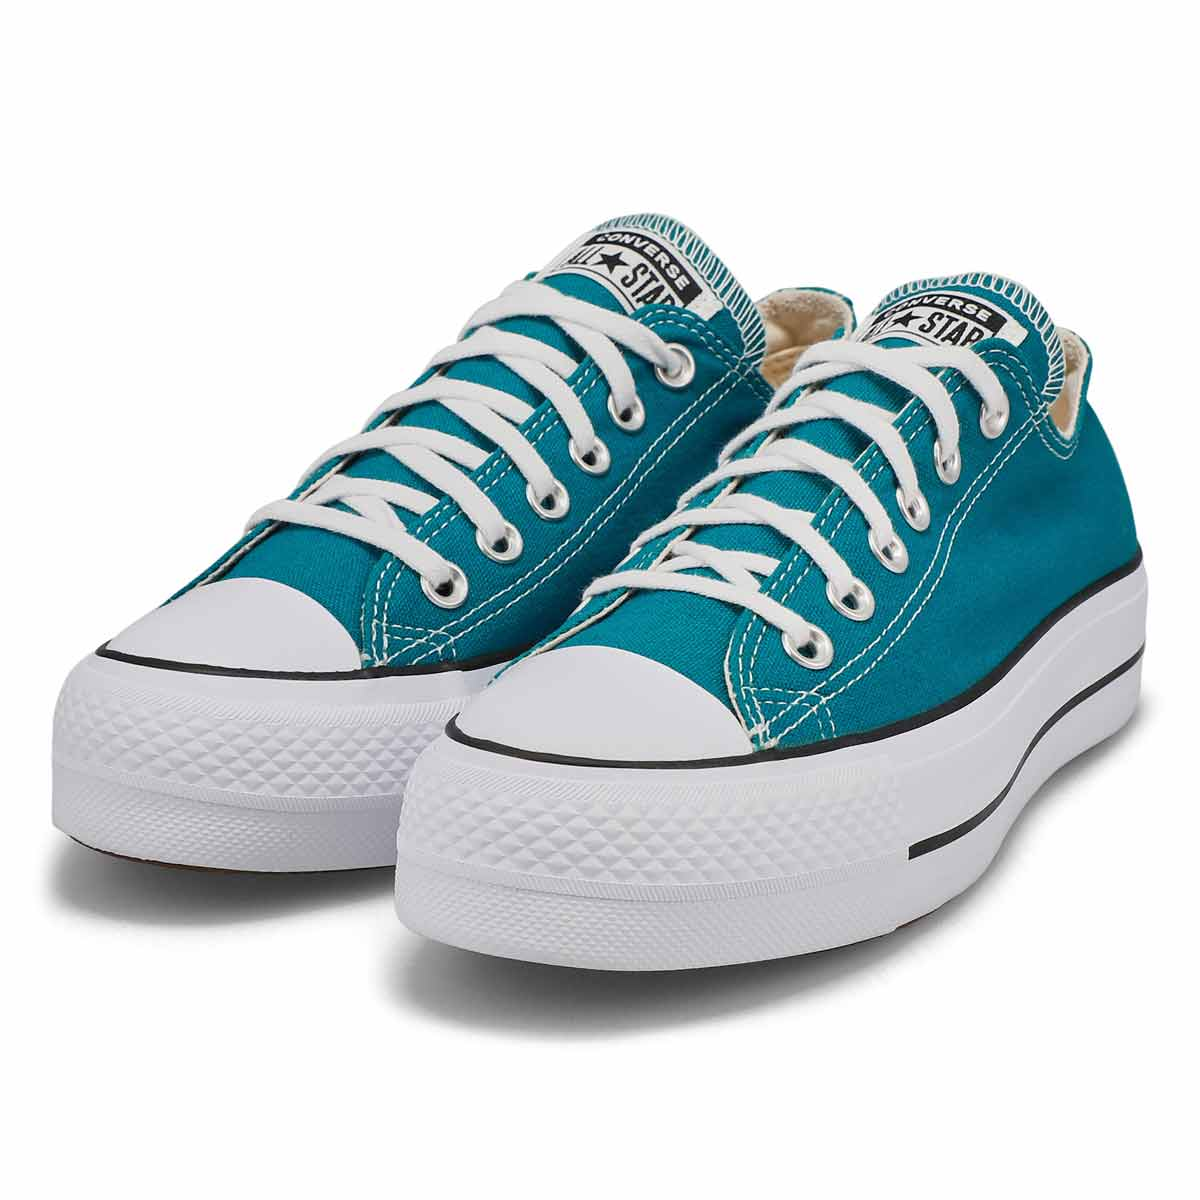 Women's All Star Lift Sneaker - Bright Spruce